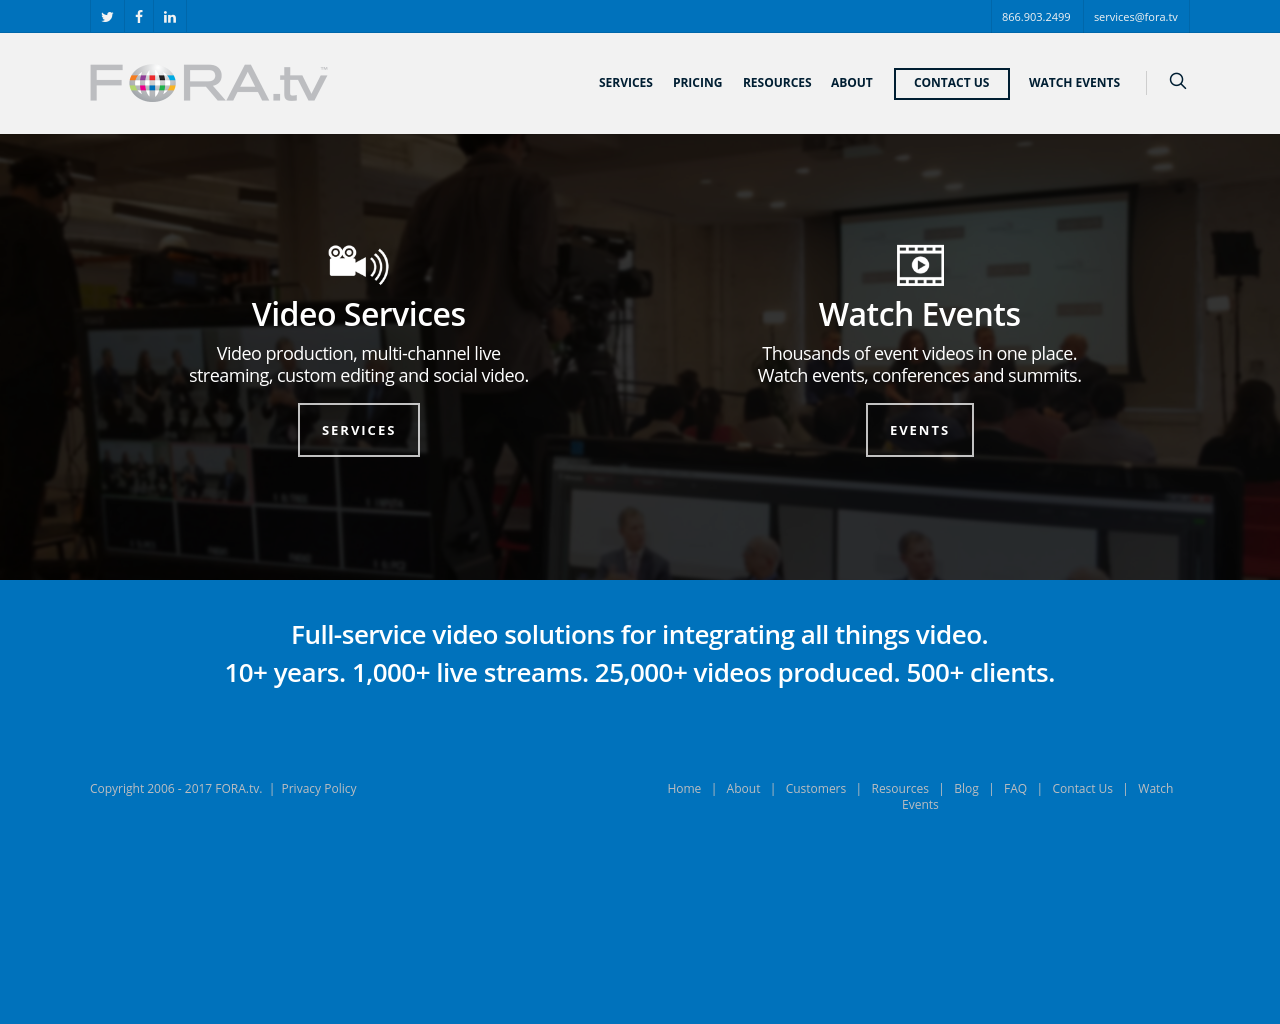 FORA-TV-Advertising-Reviews-Pricing